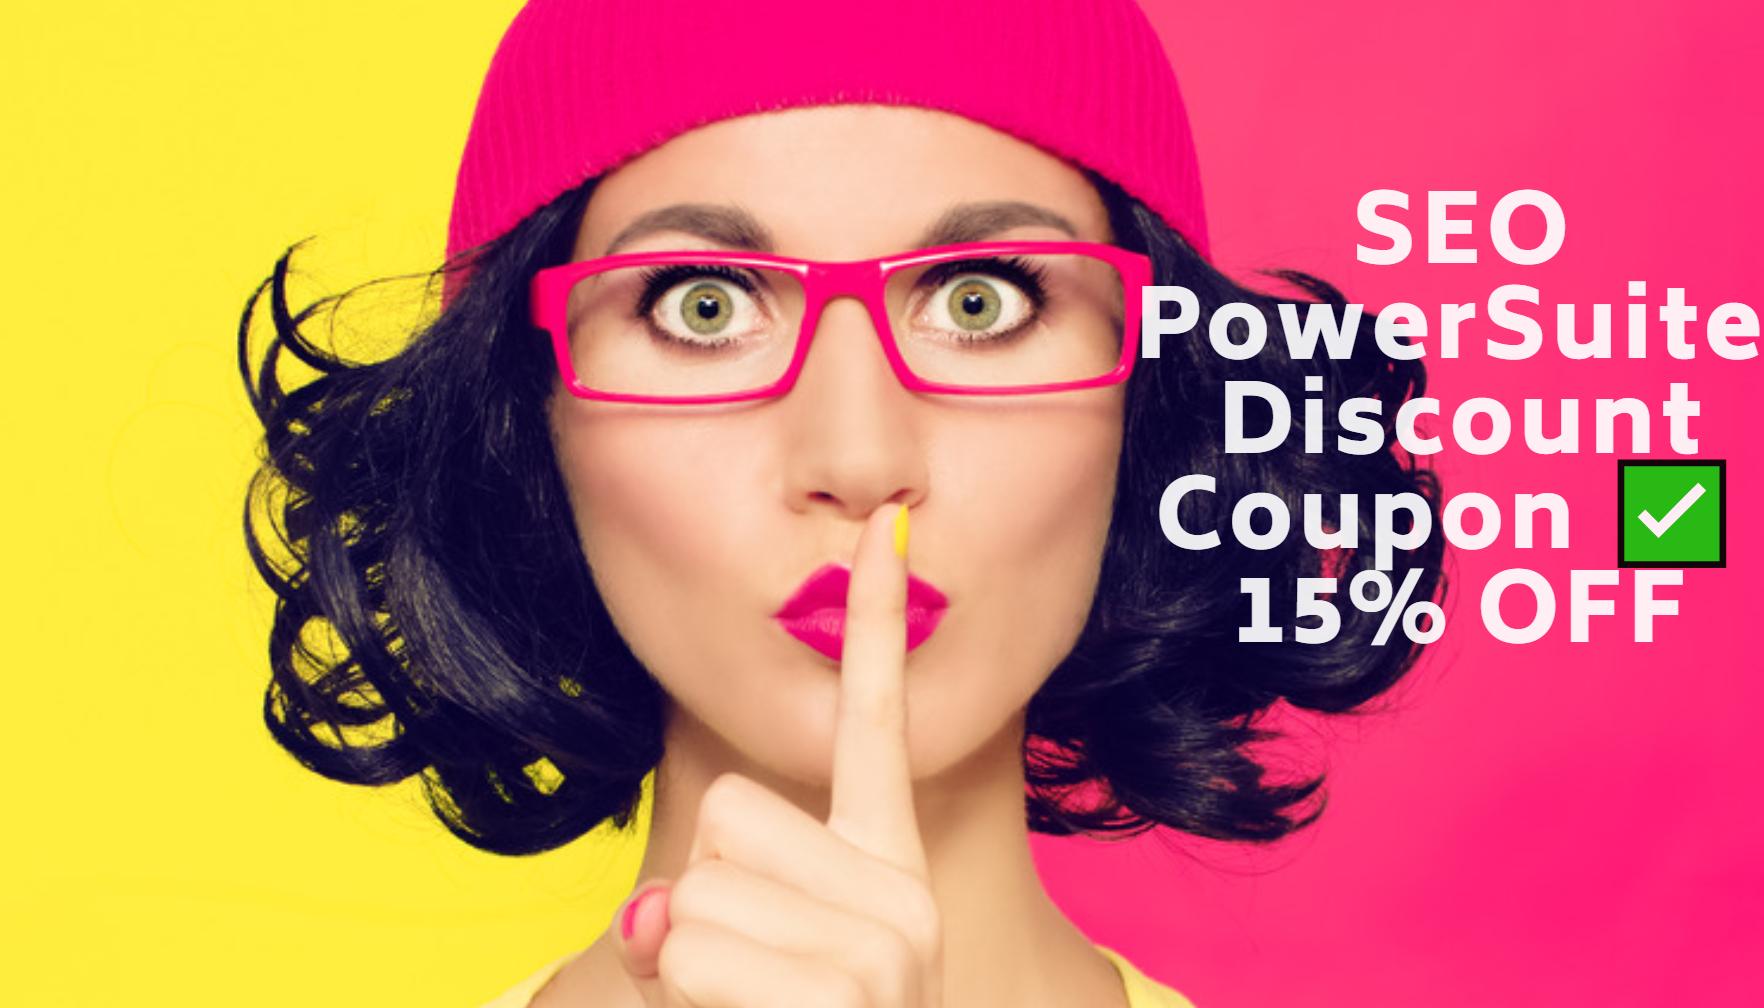 SEO PowerSuite Link Assistant Discount Coupon